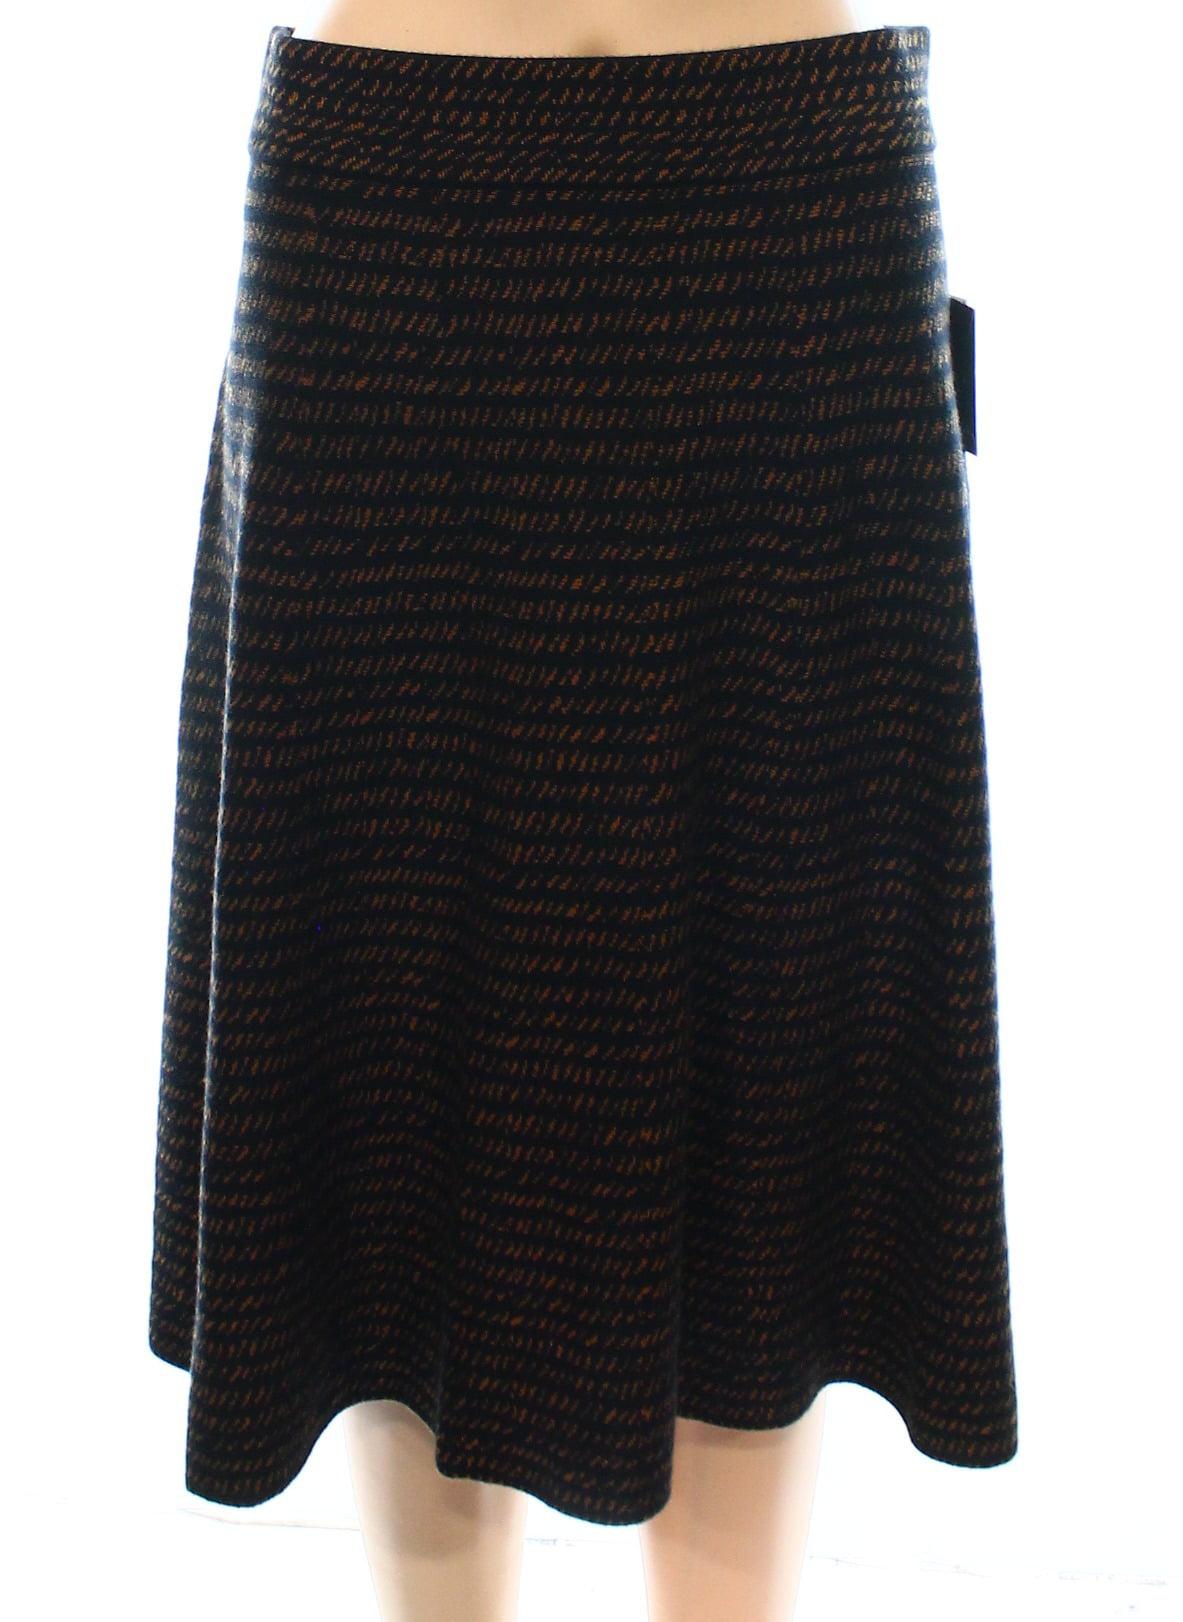 Alfani New Black Brown Women's Size Small S A-Line Striped Knit Skirt by Alfani